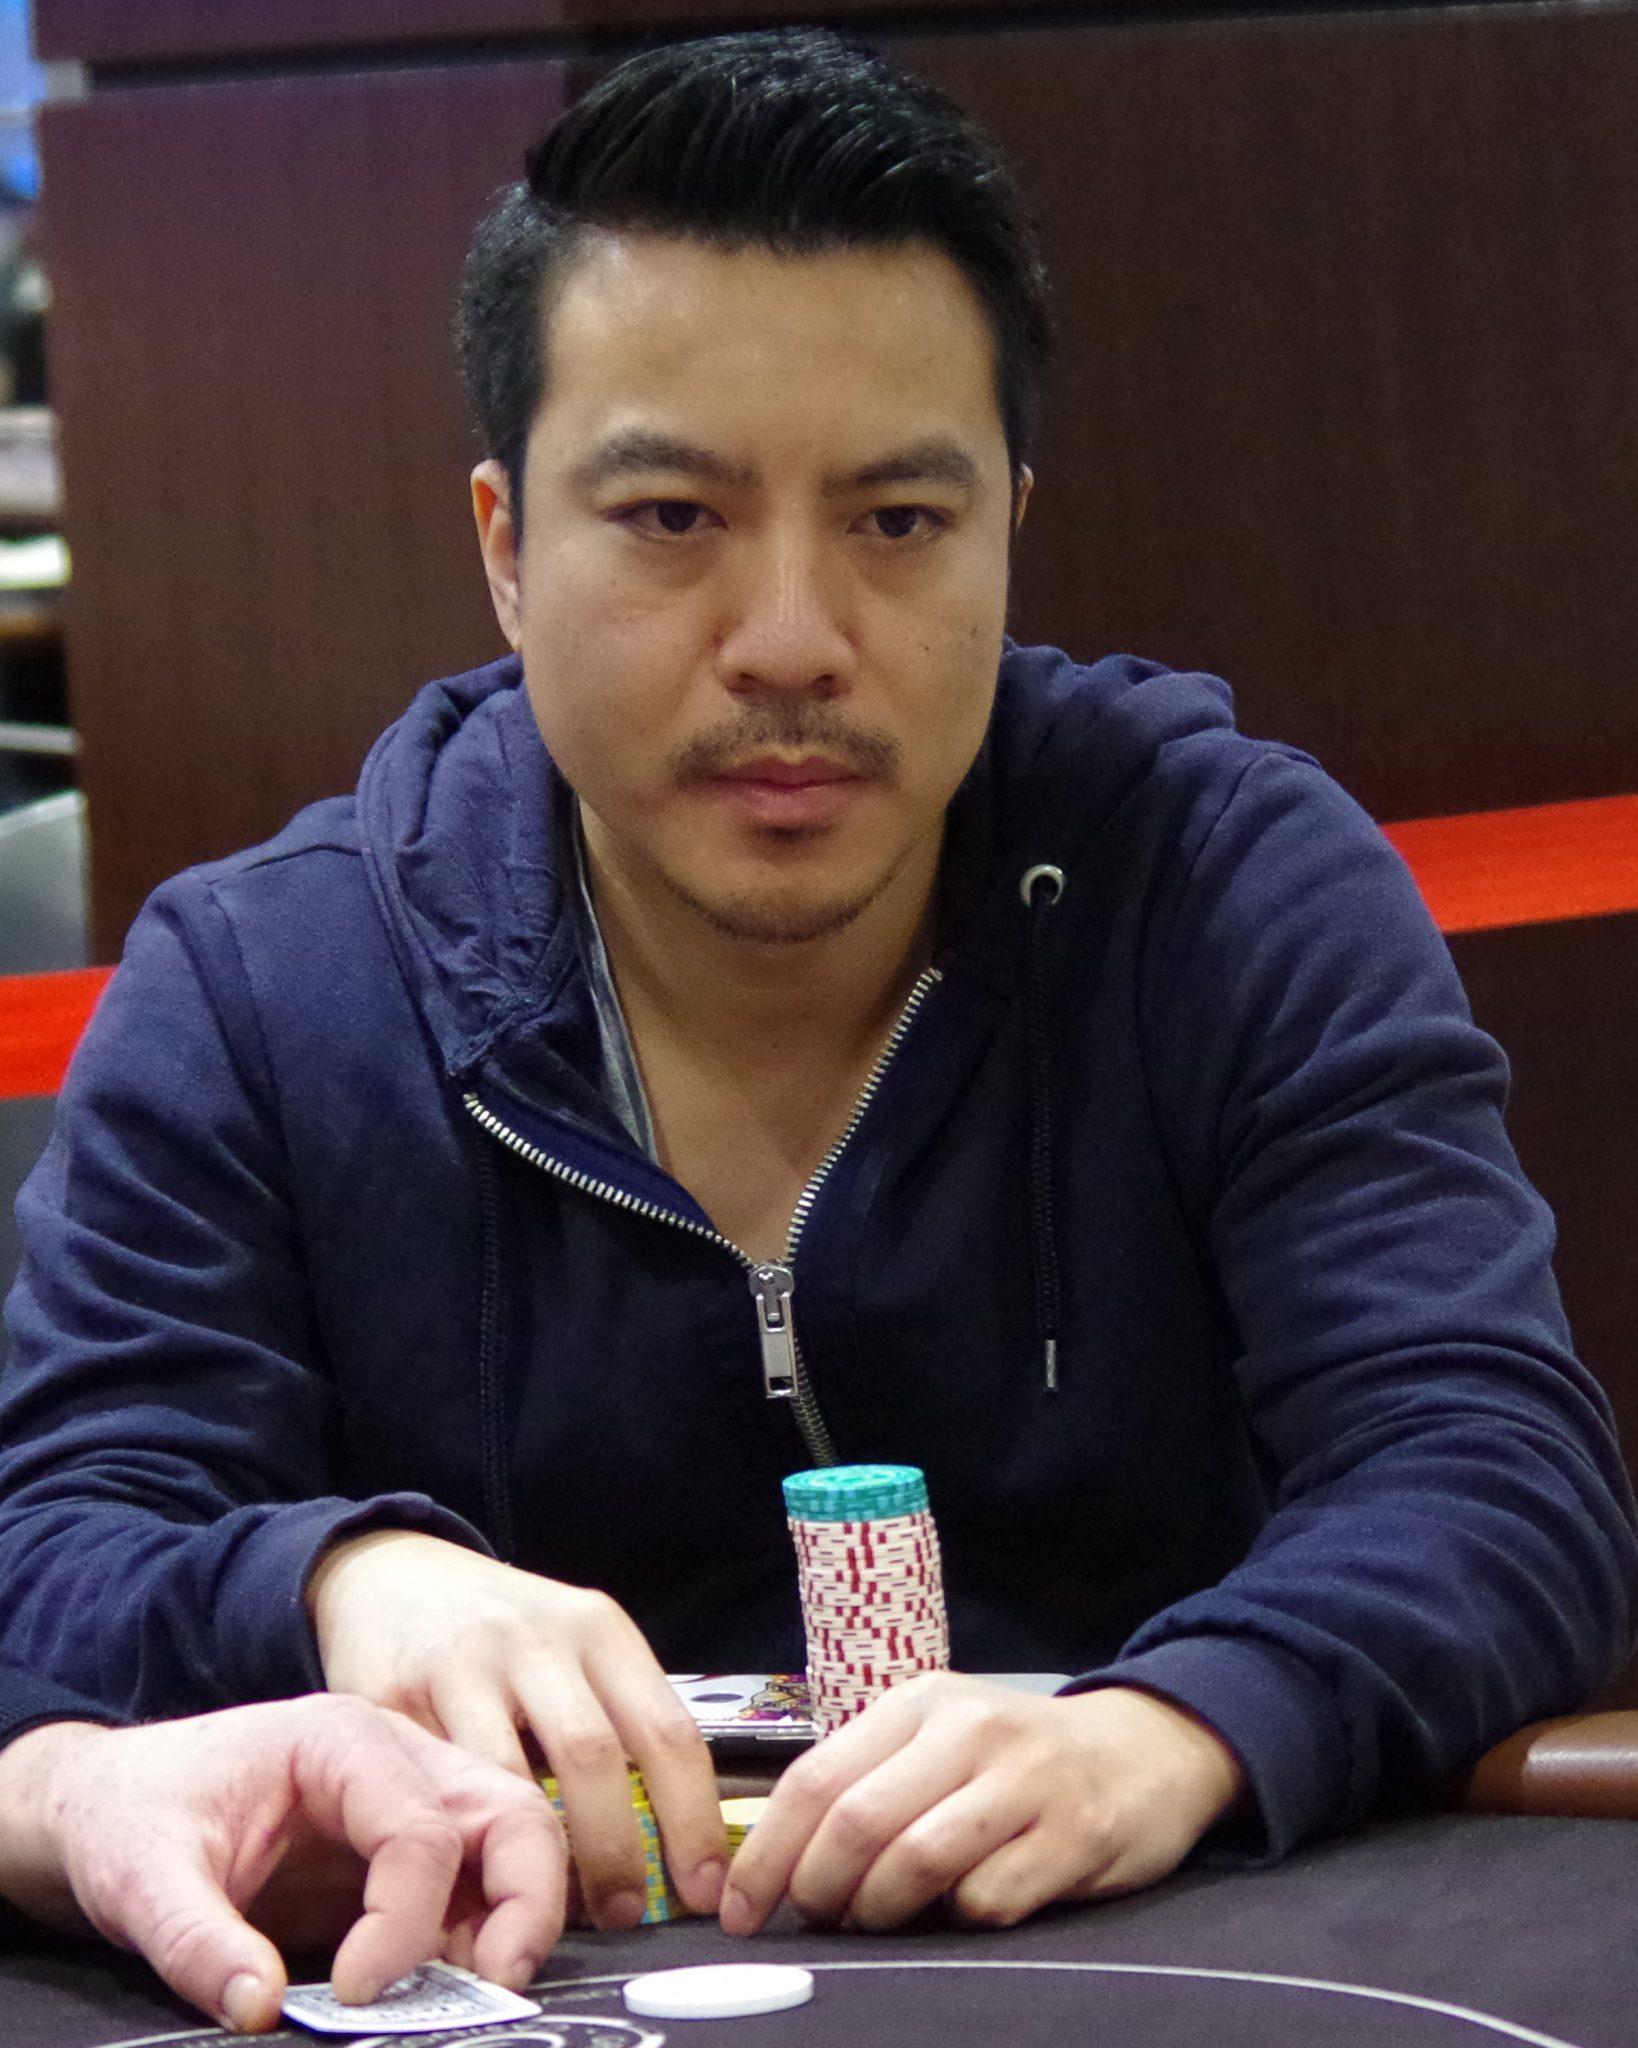 Holdem tournament blind structure